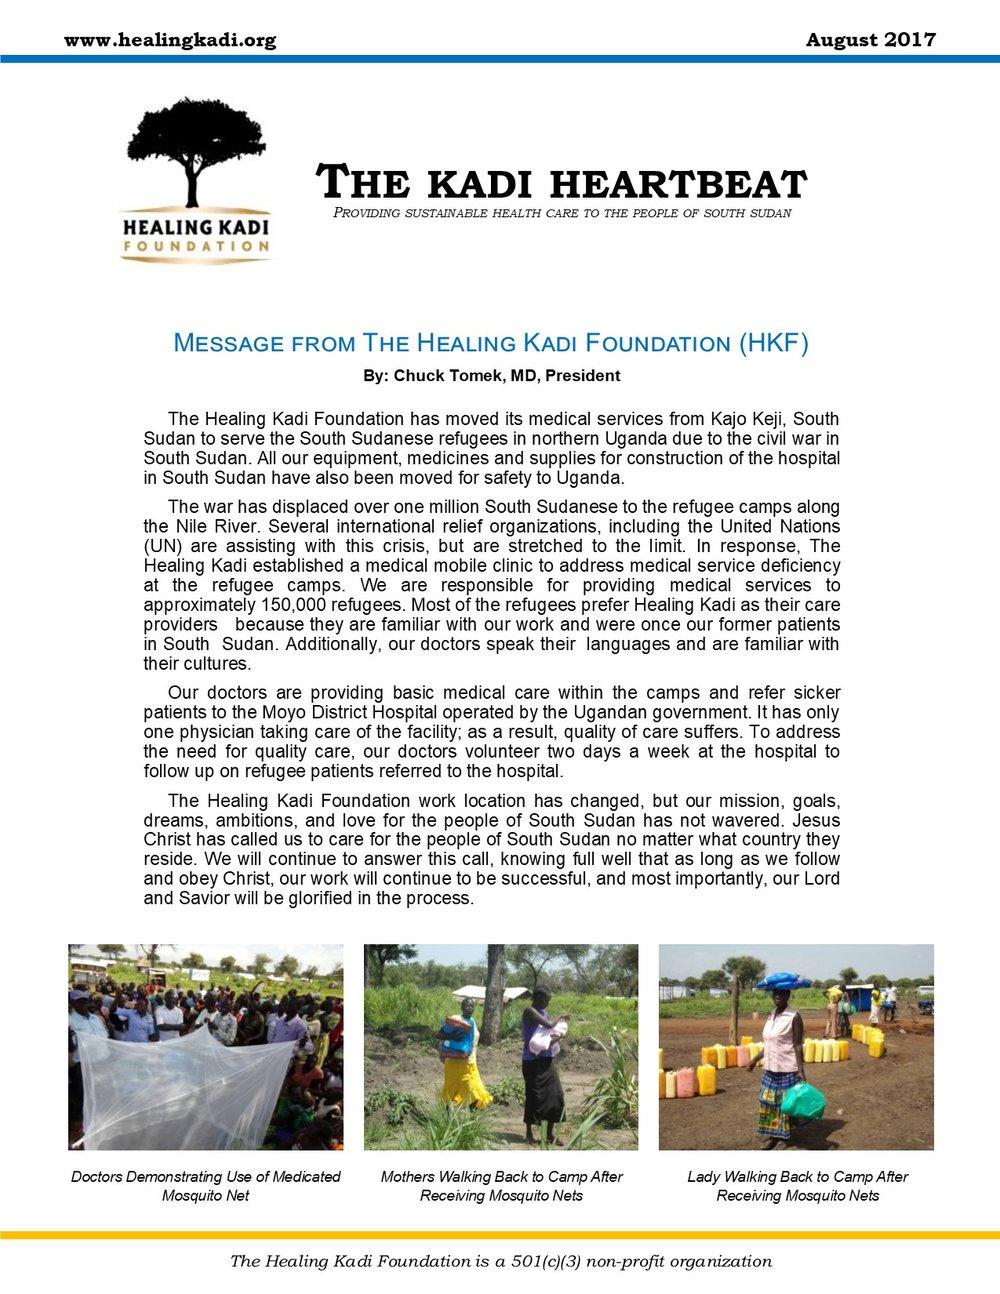 The Kadi Beat_August_6_2017-p1.jpg